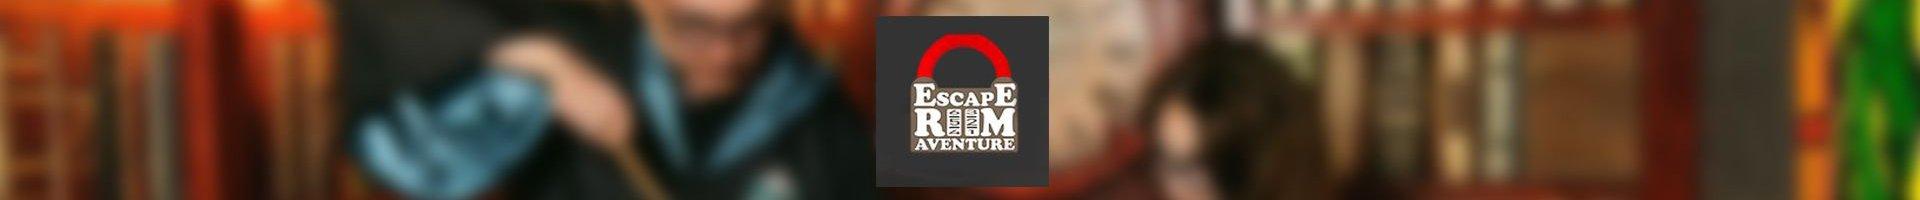 escape room aventure beziers.jpg